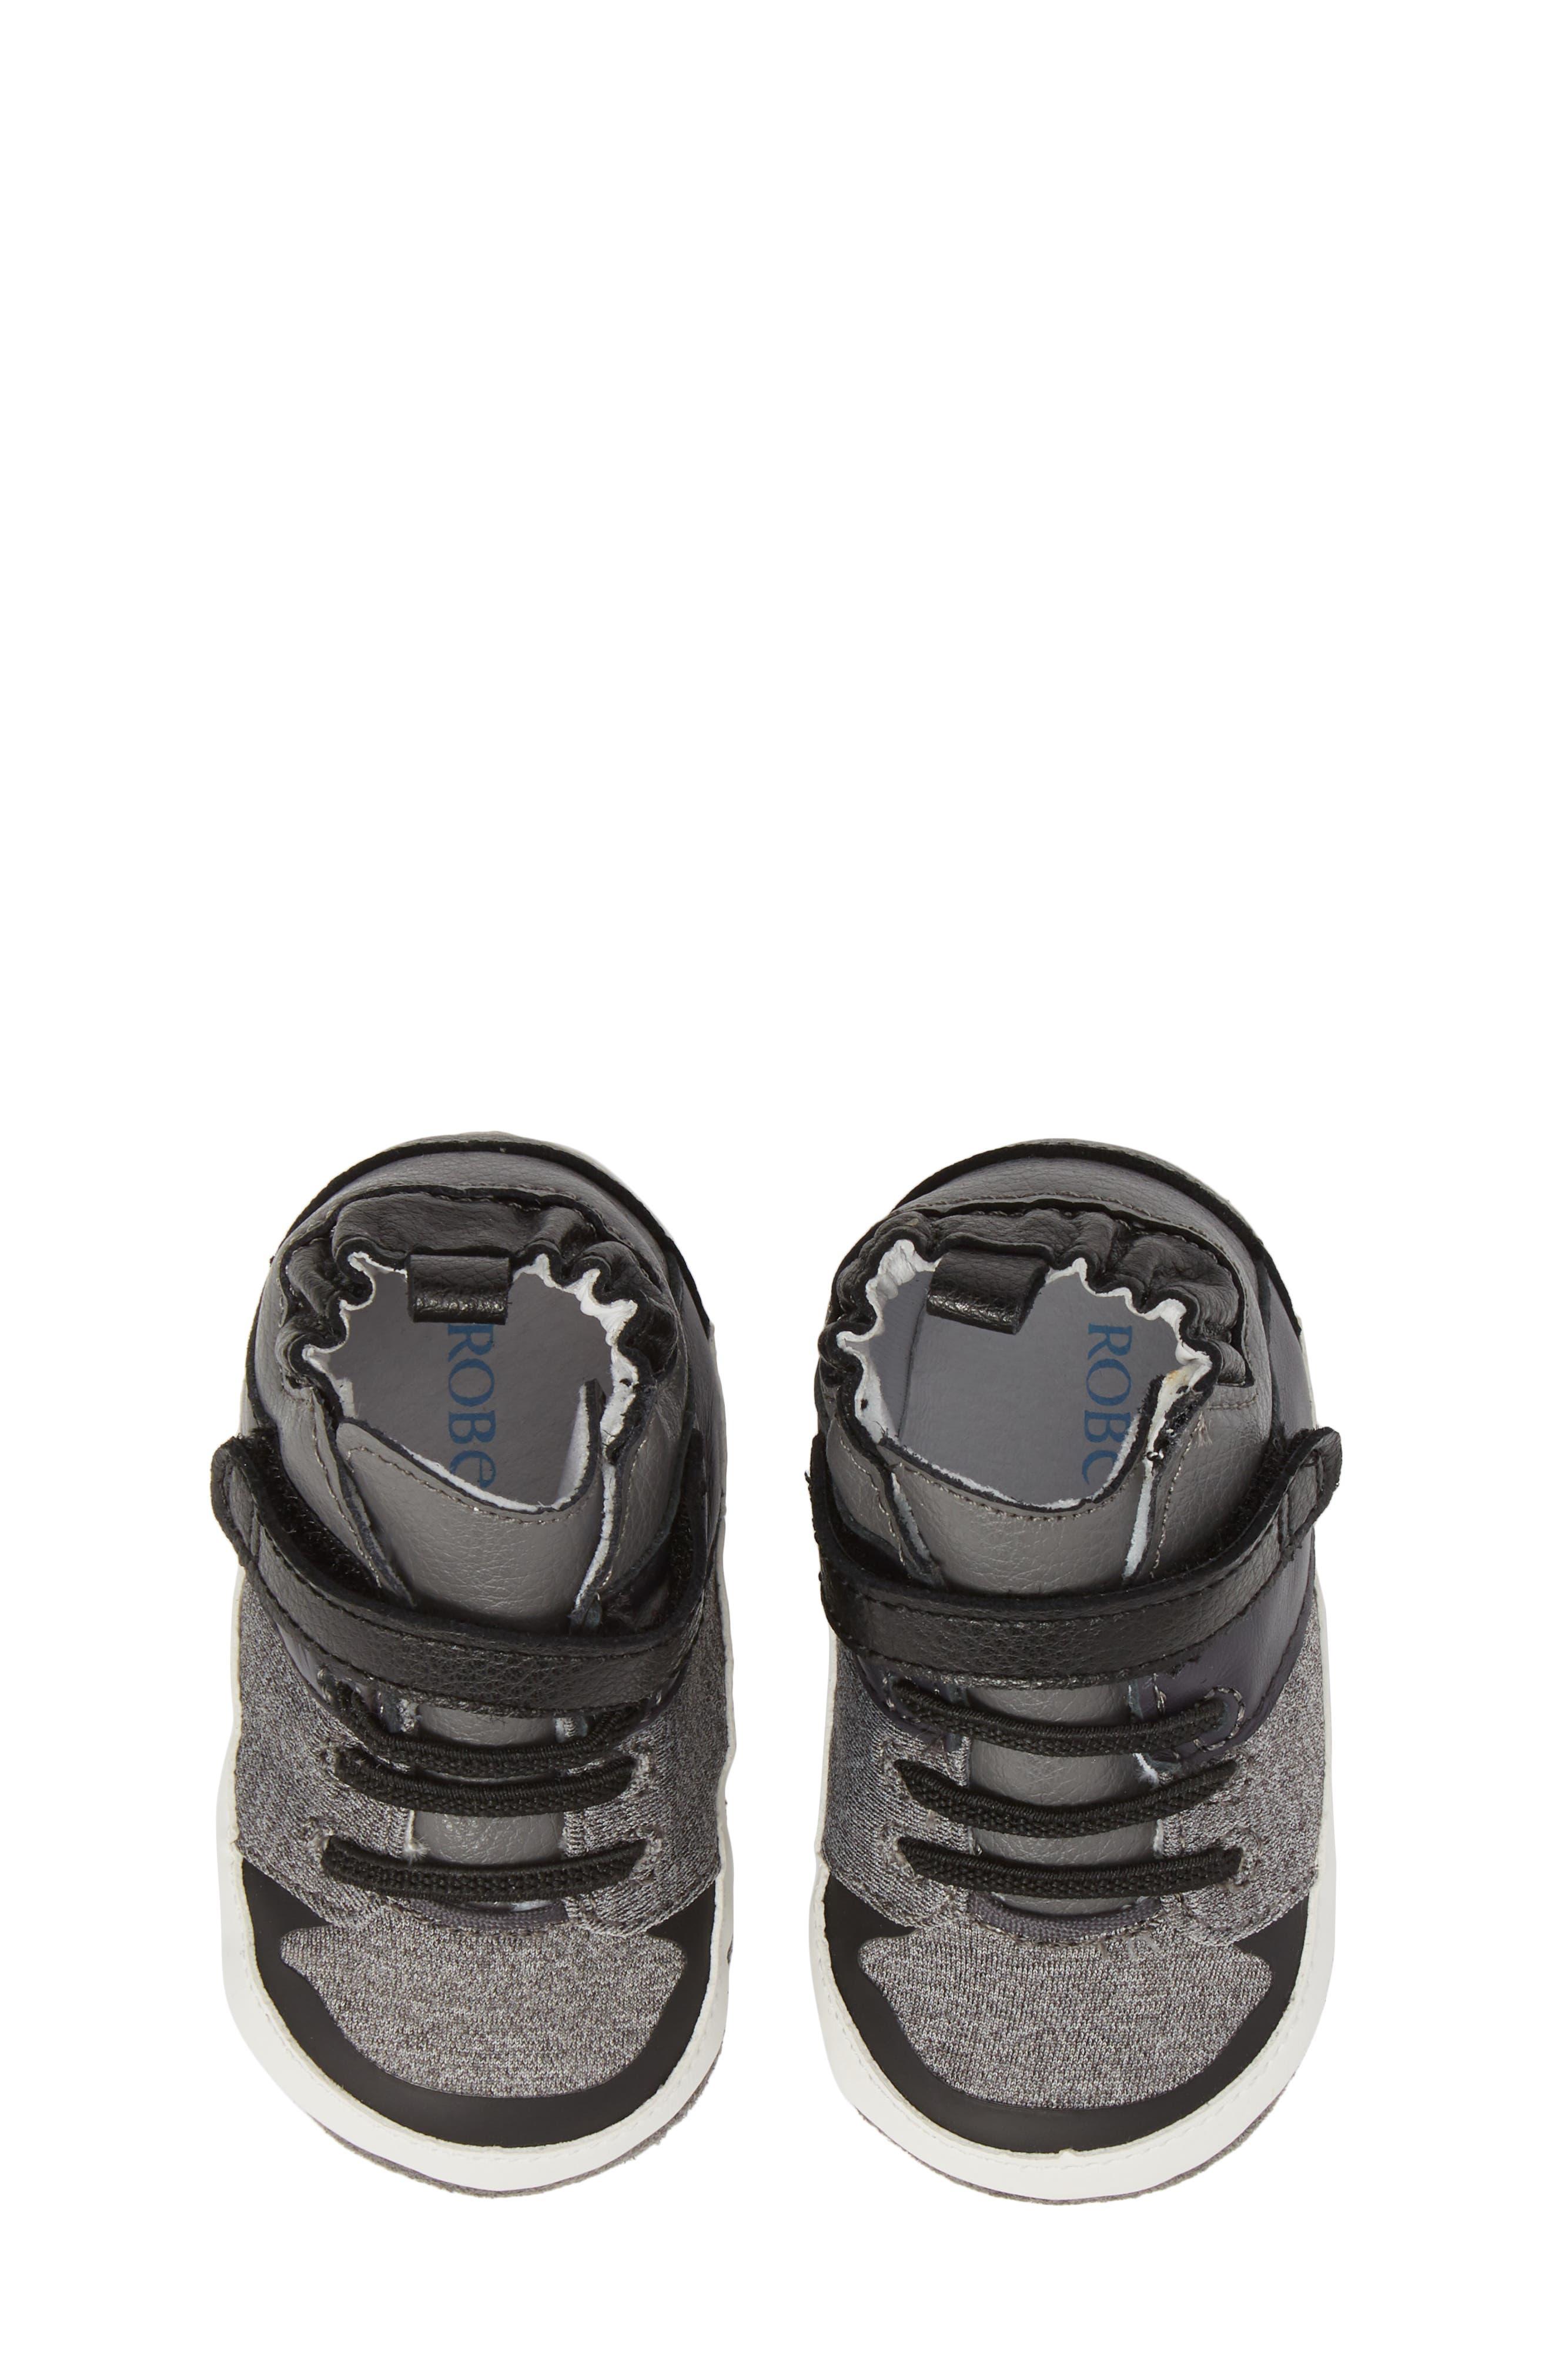 Alternate Image 1 Selected - Robeez® Zachary High Top Crib Sneaker (Baby & Walker)